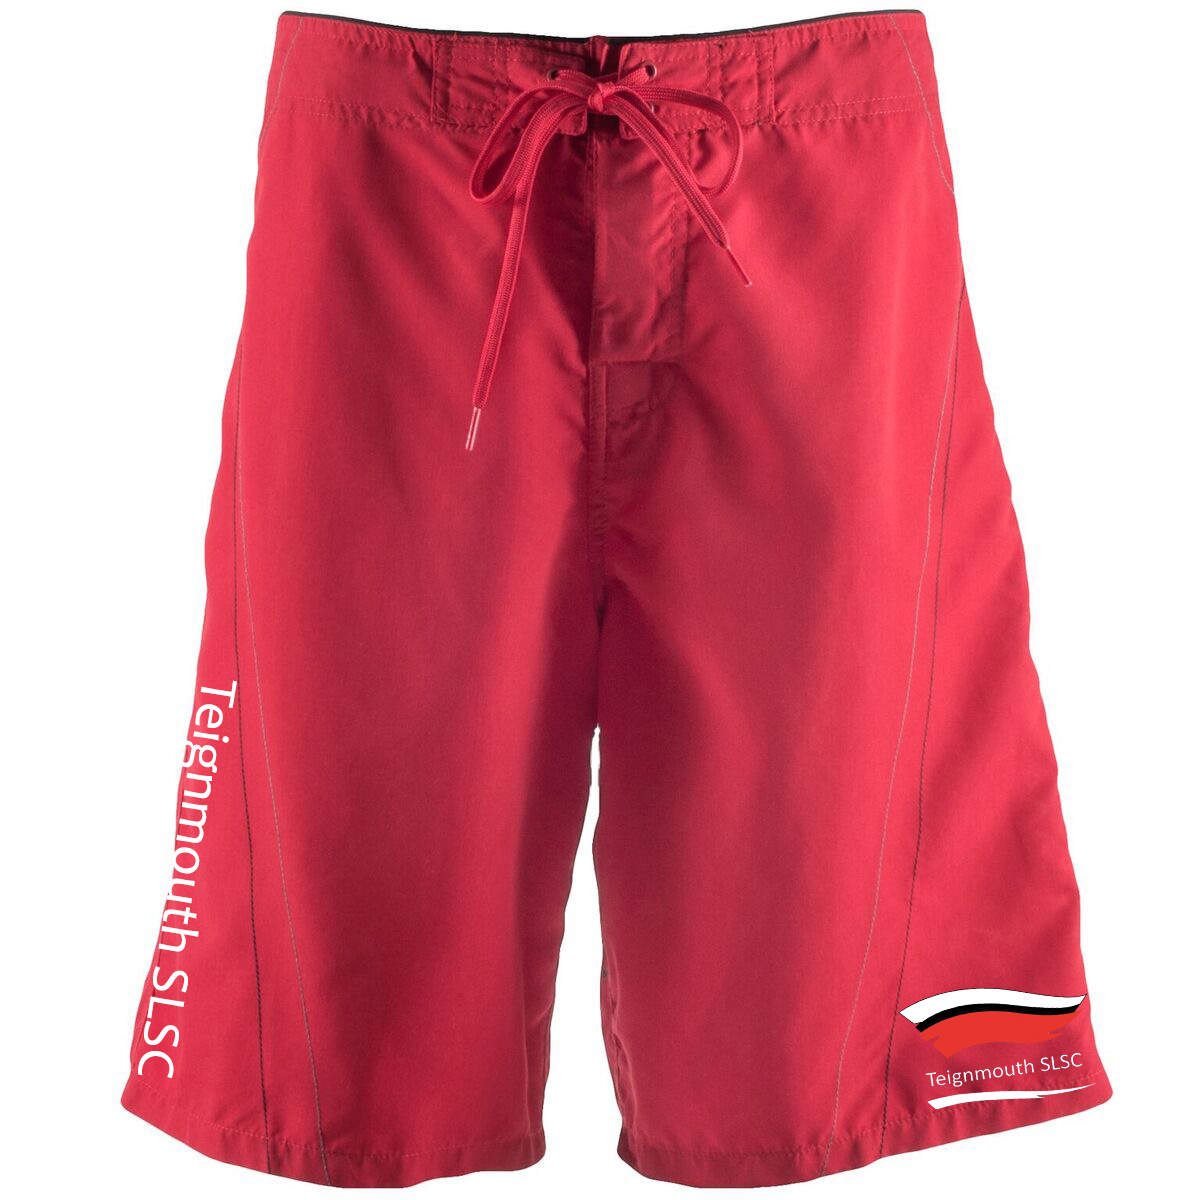 TSLSC Board Shorts